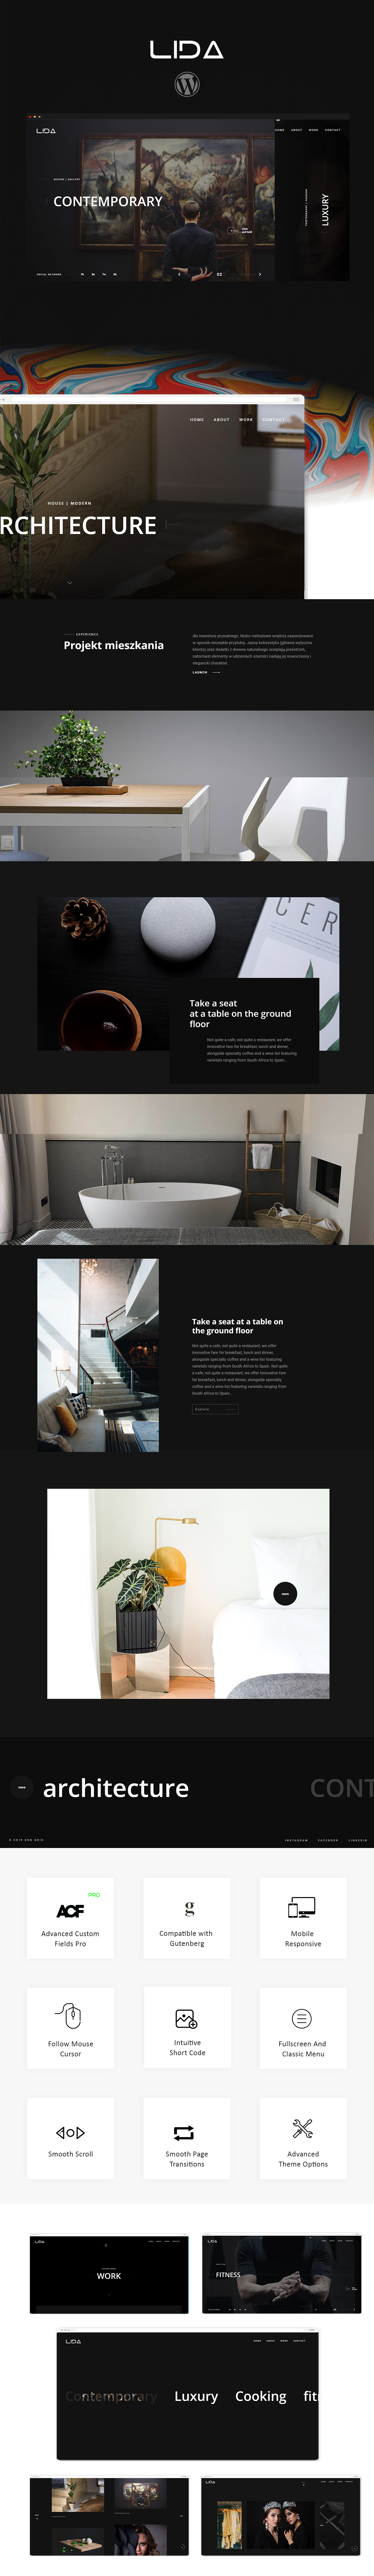 Lida - Ajax Portfolio WordPress Theme - 1